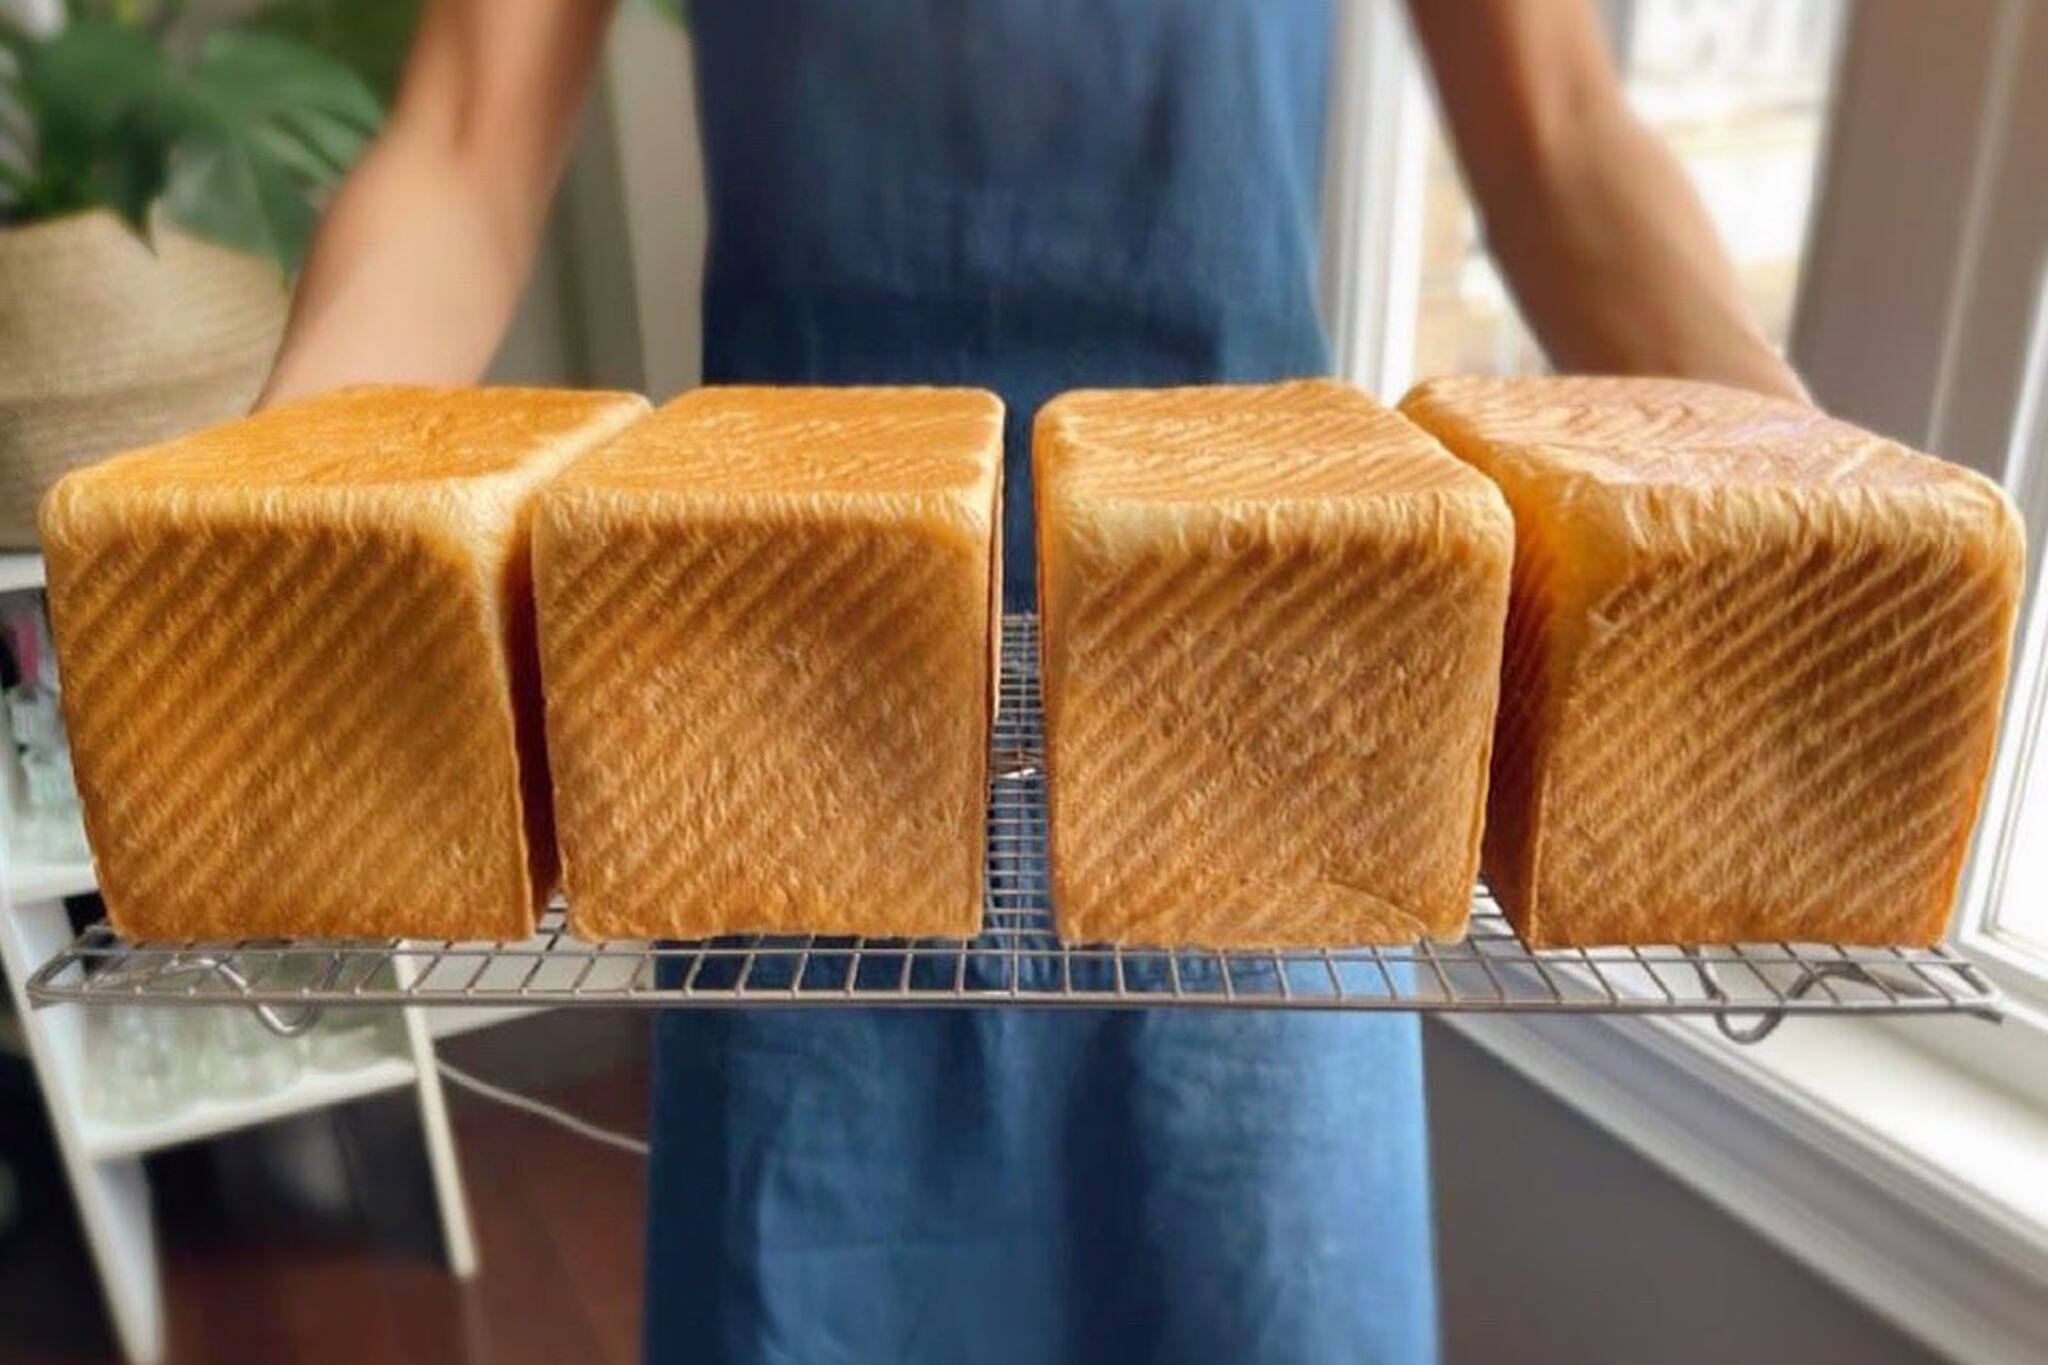 japanese milk bread toronto